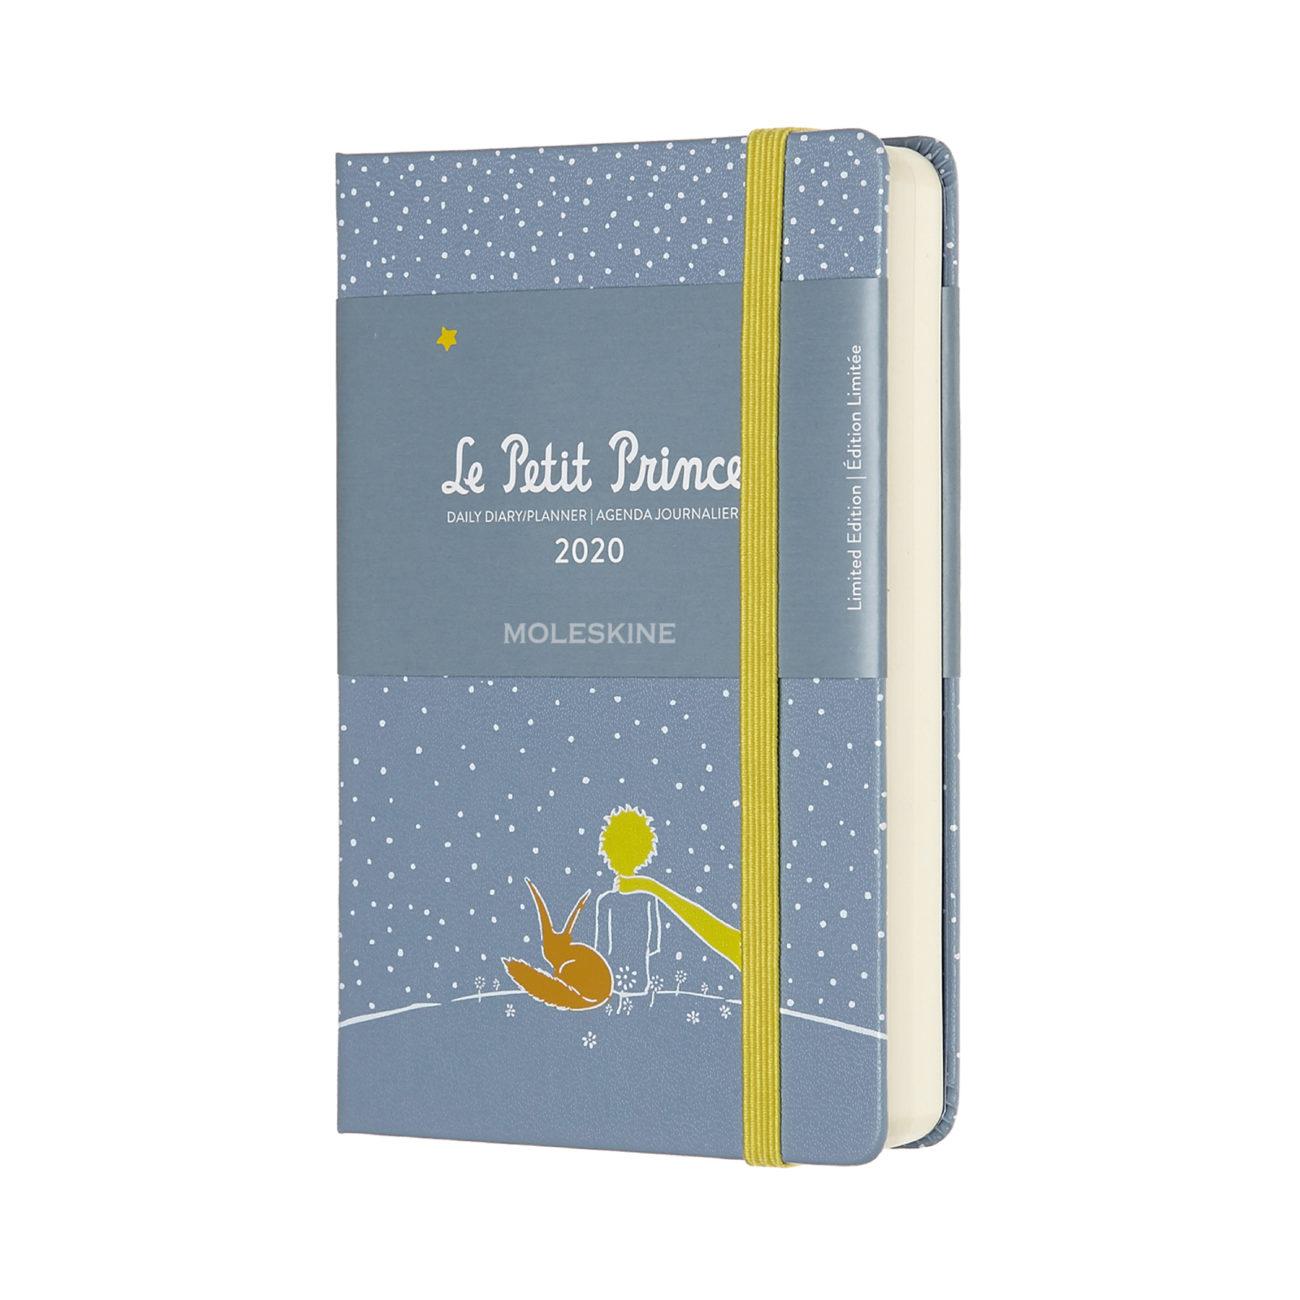 Edición limitada de agenda pocket para 2020 (9X14 cm). Fabricada por...